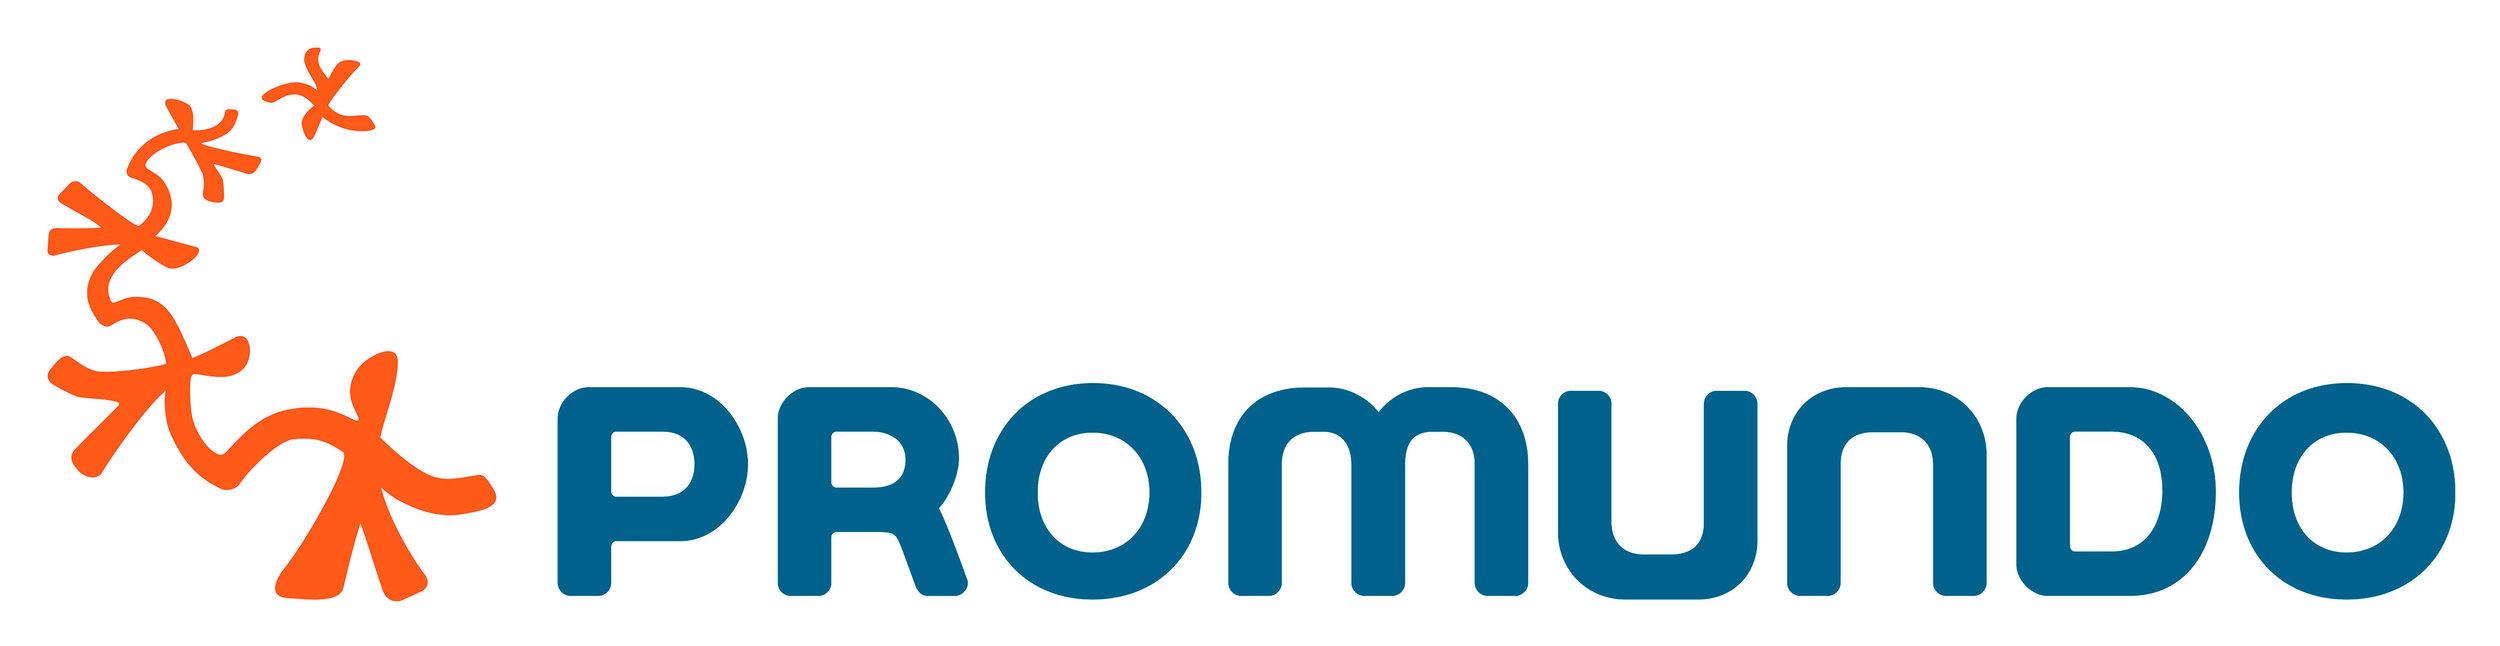 Promundo_Logo_H_border.jpg